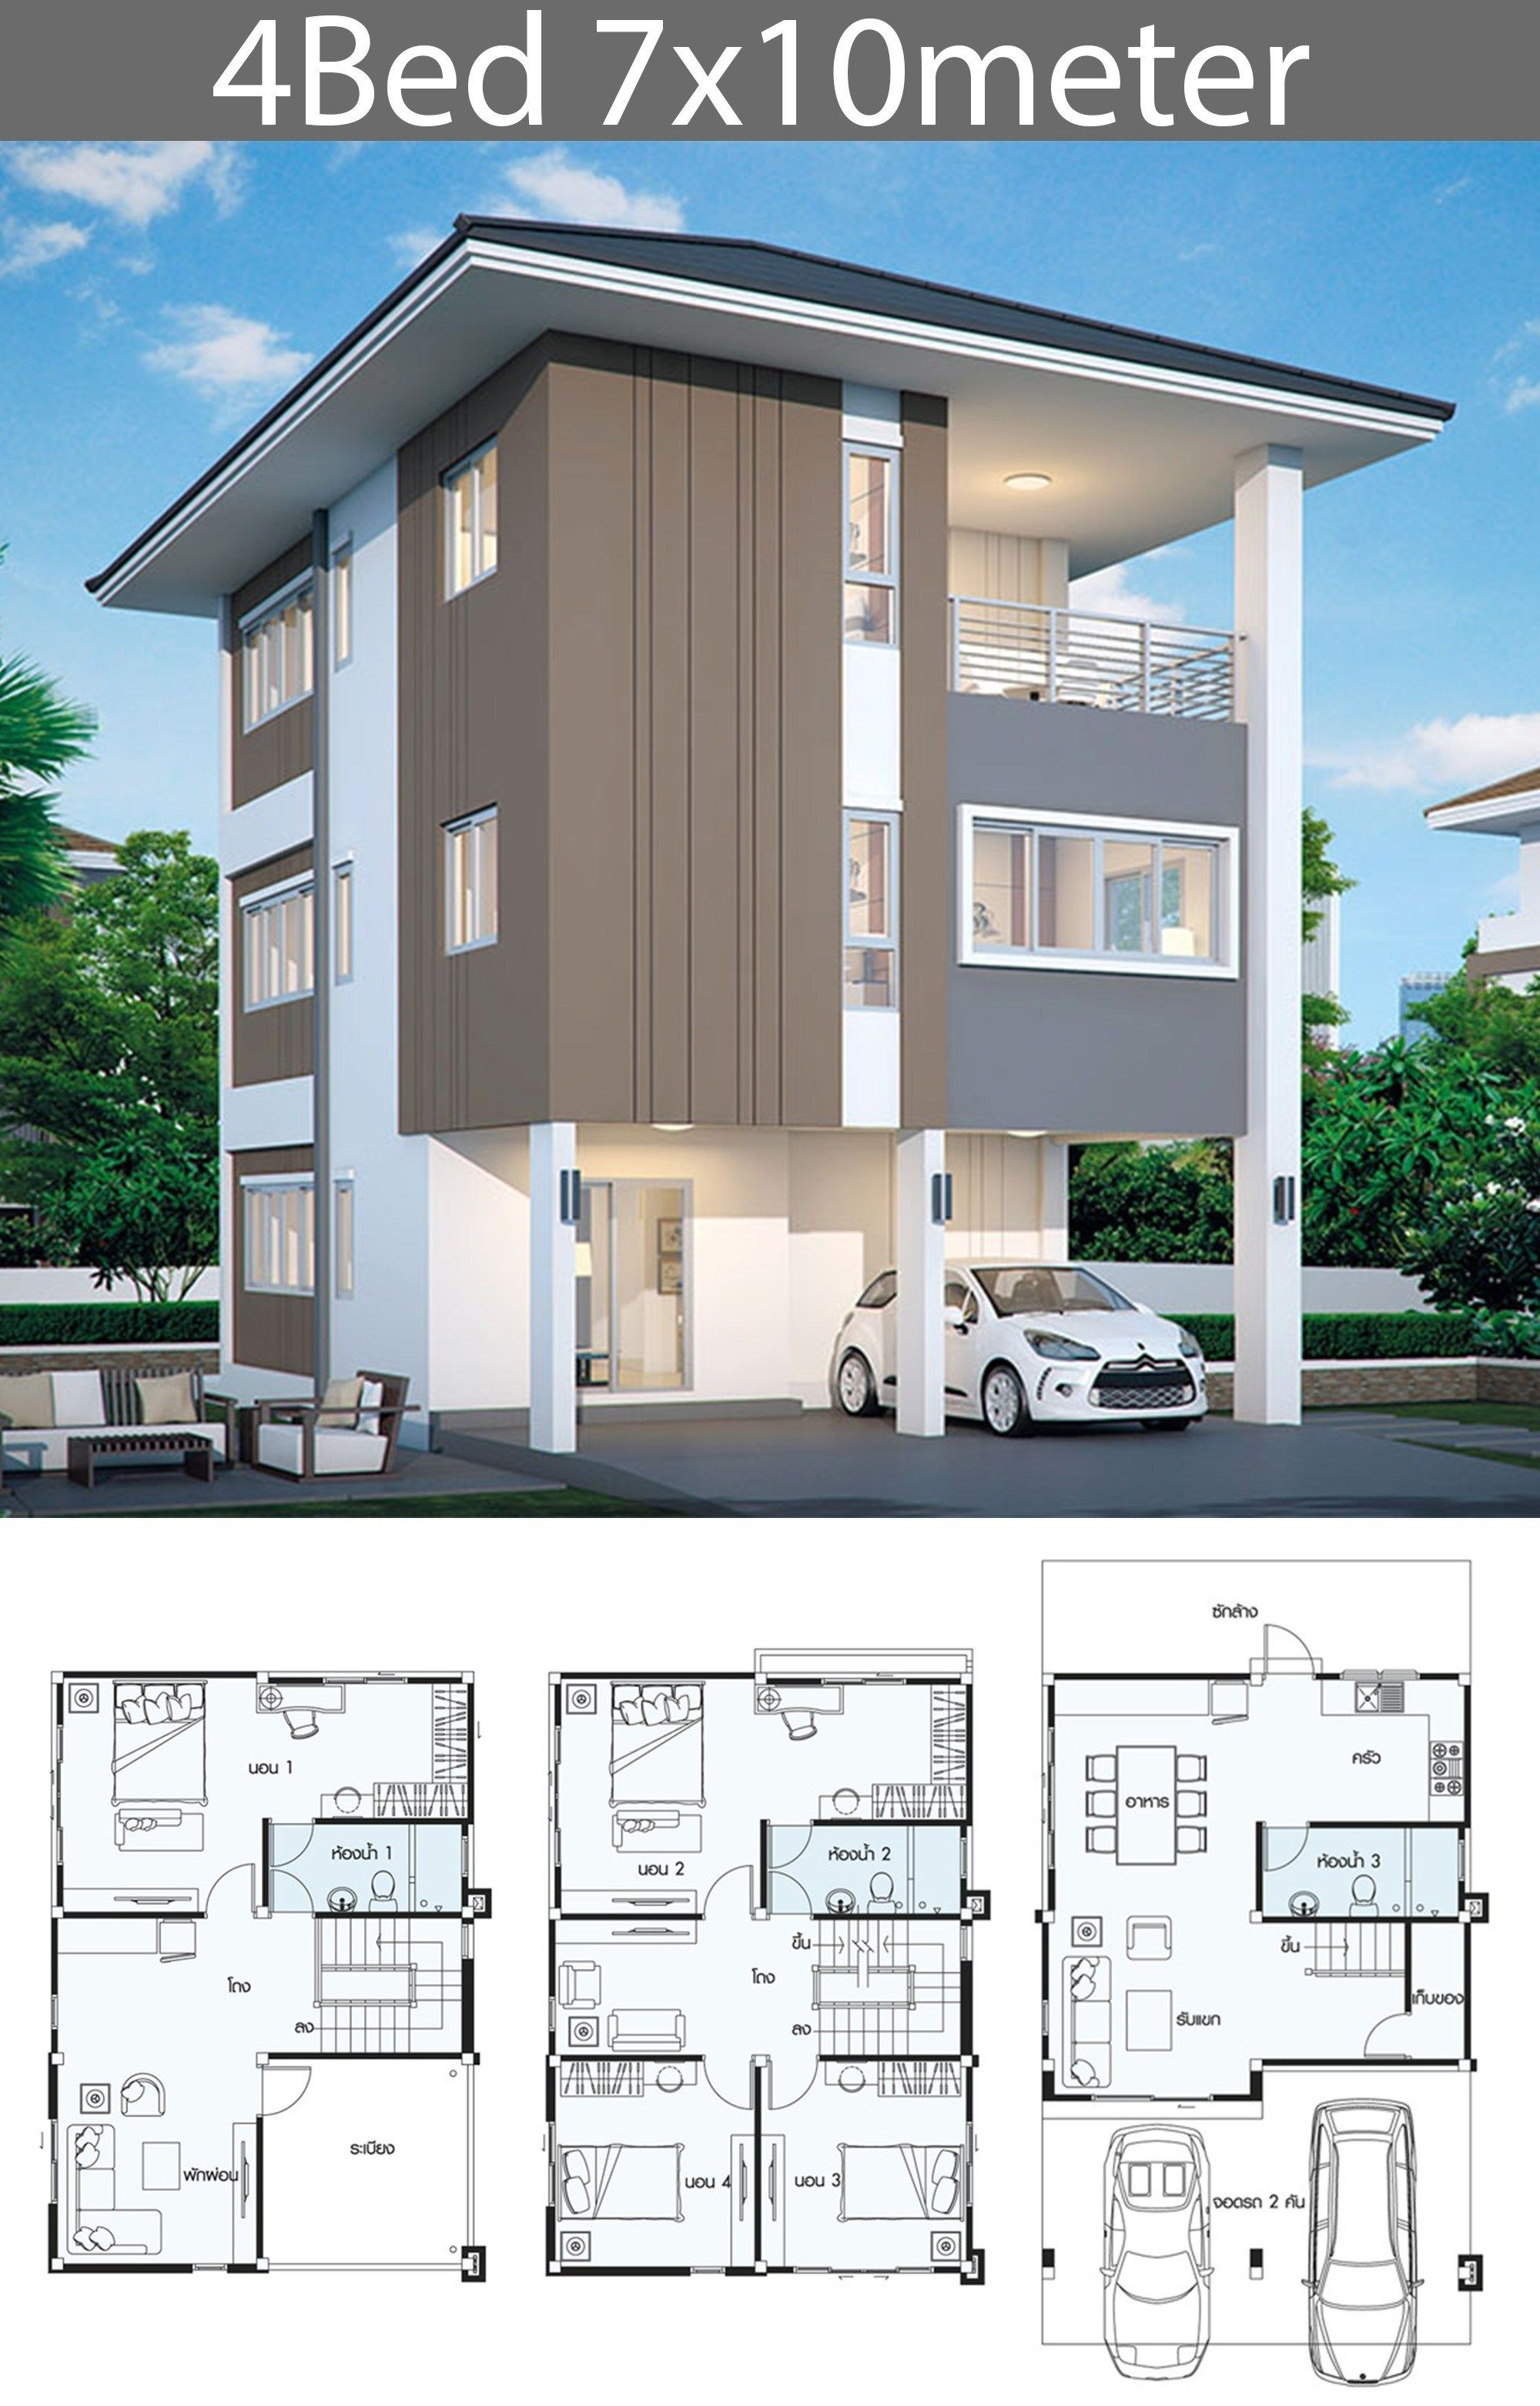 5 Ideas Home Design Plan 7x10m Samphoas Plan House Architecture Design Home Design Plans Model House Plan